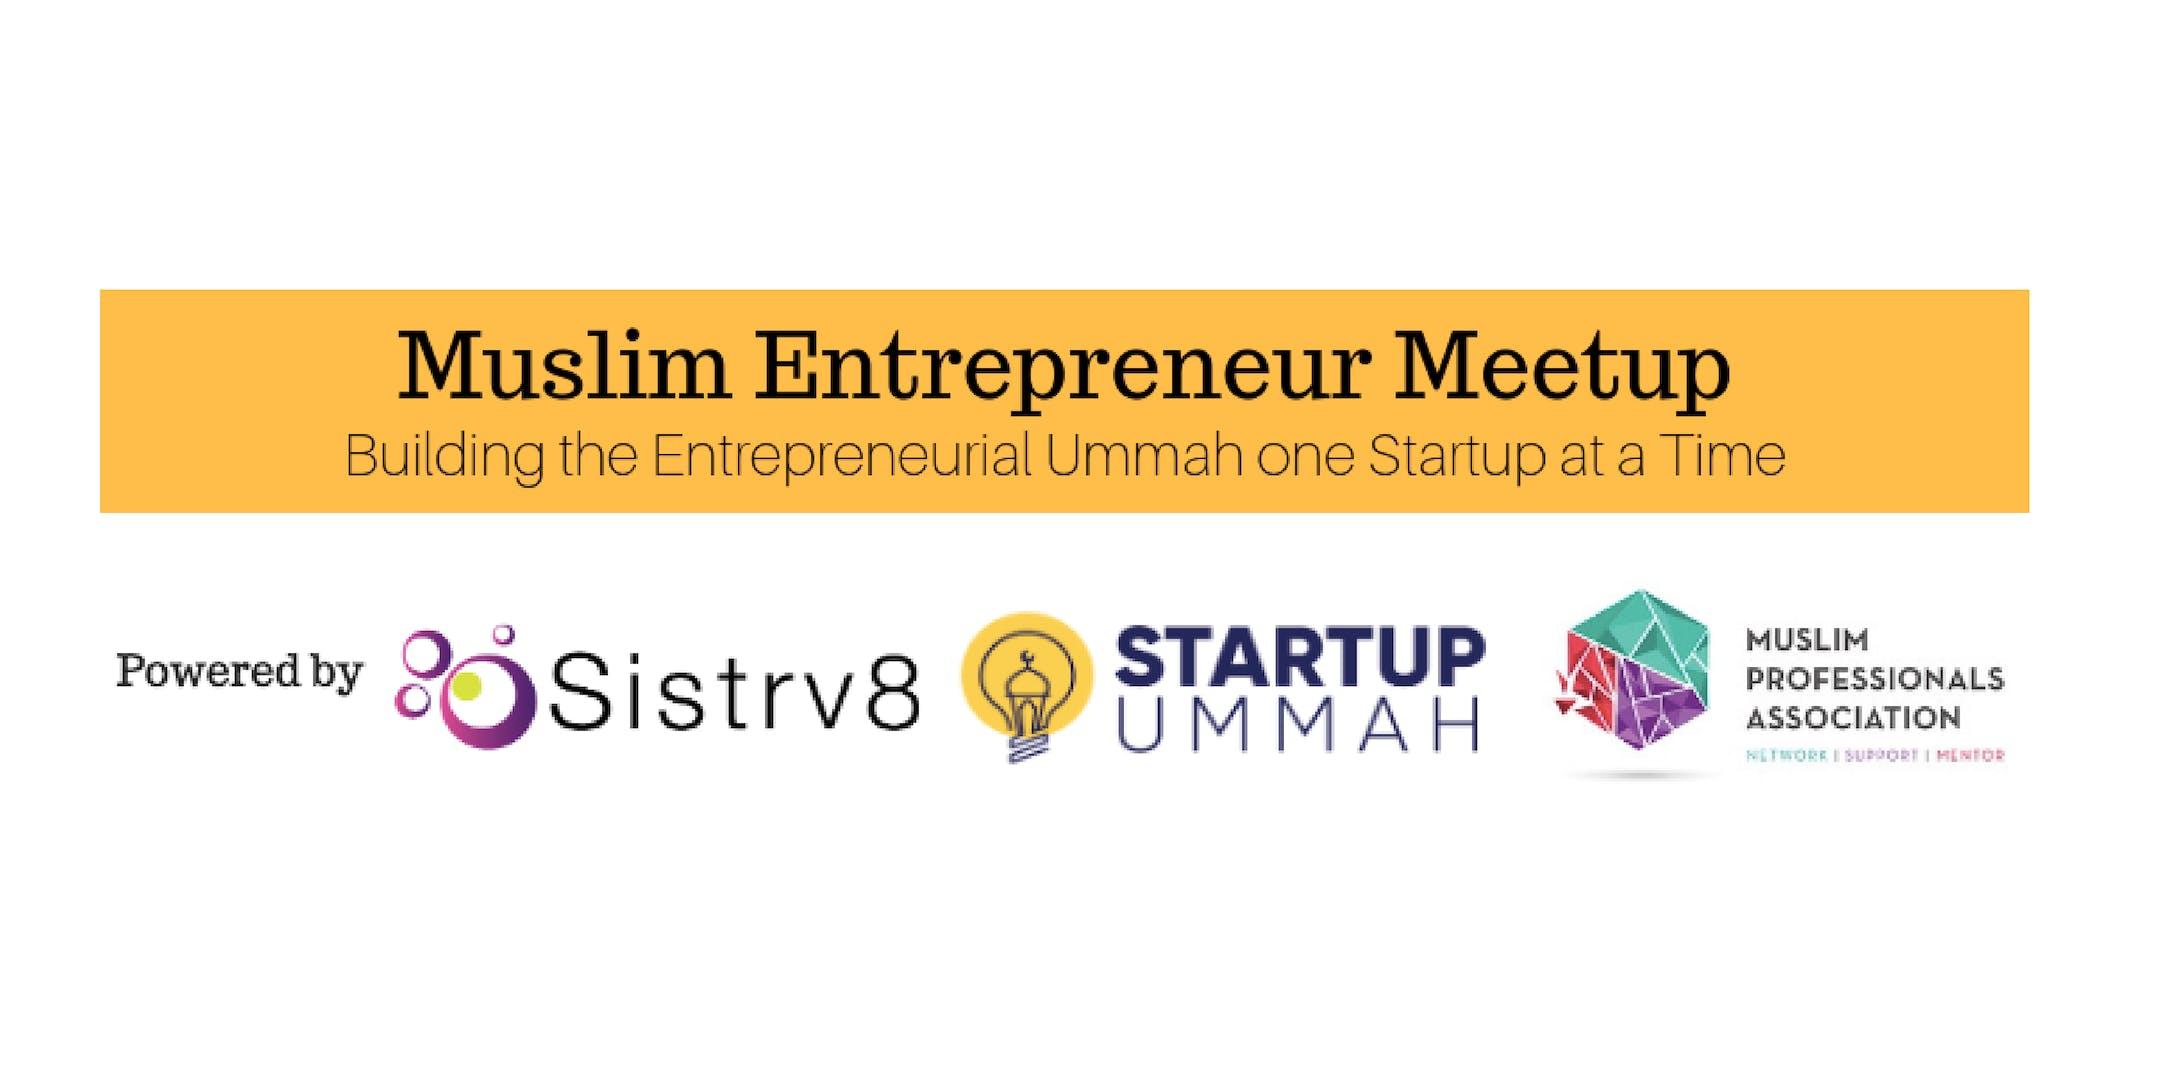 Building the Muslim Entrepreneurial Ummah one